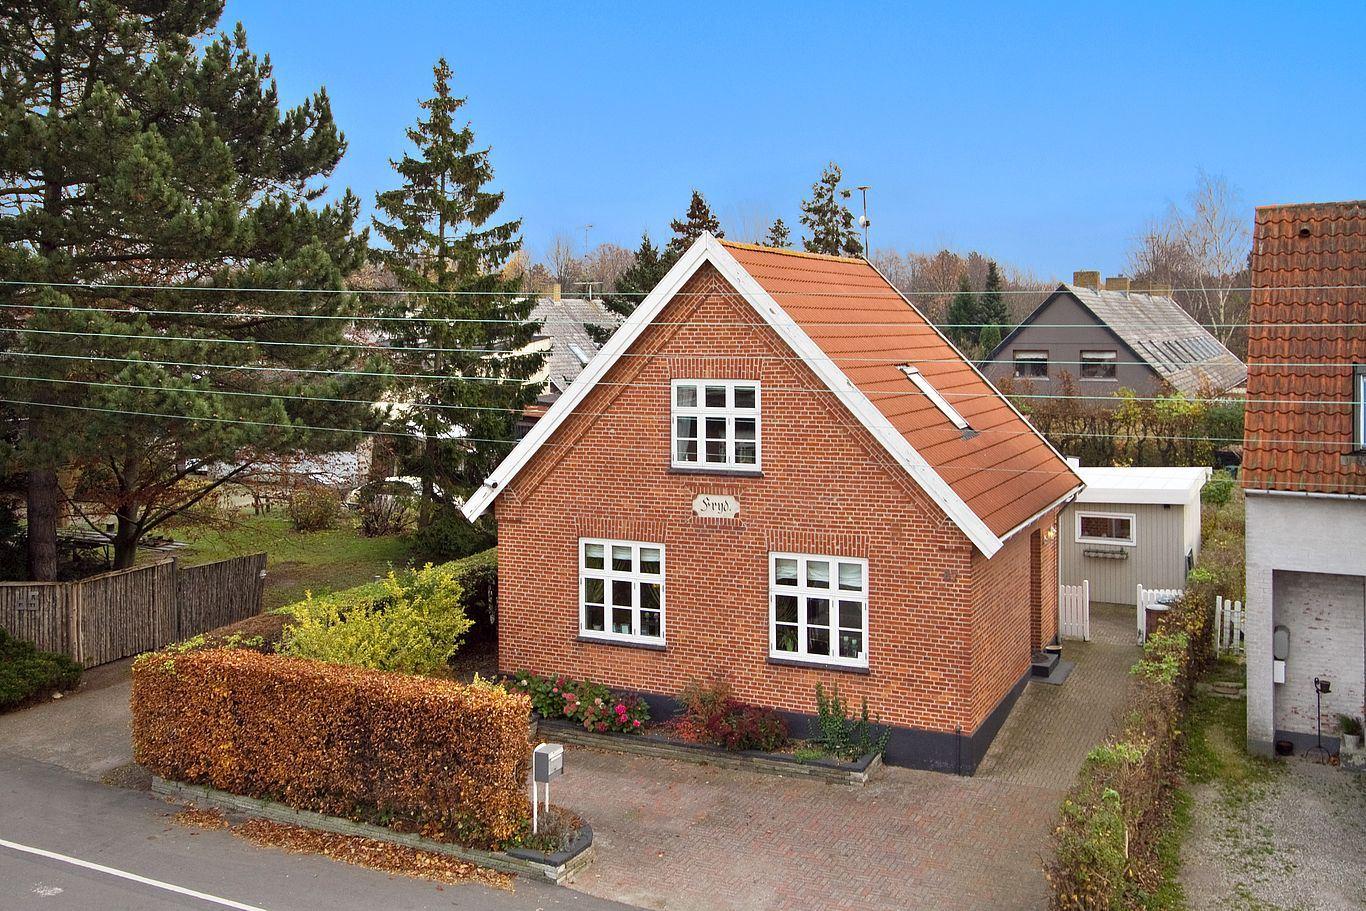 Ringstedvej 67, 4000 Roskilde